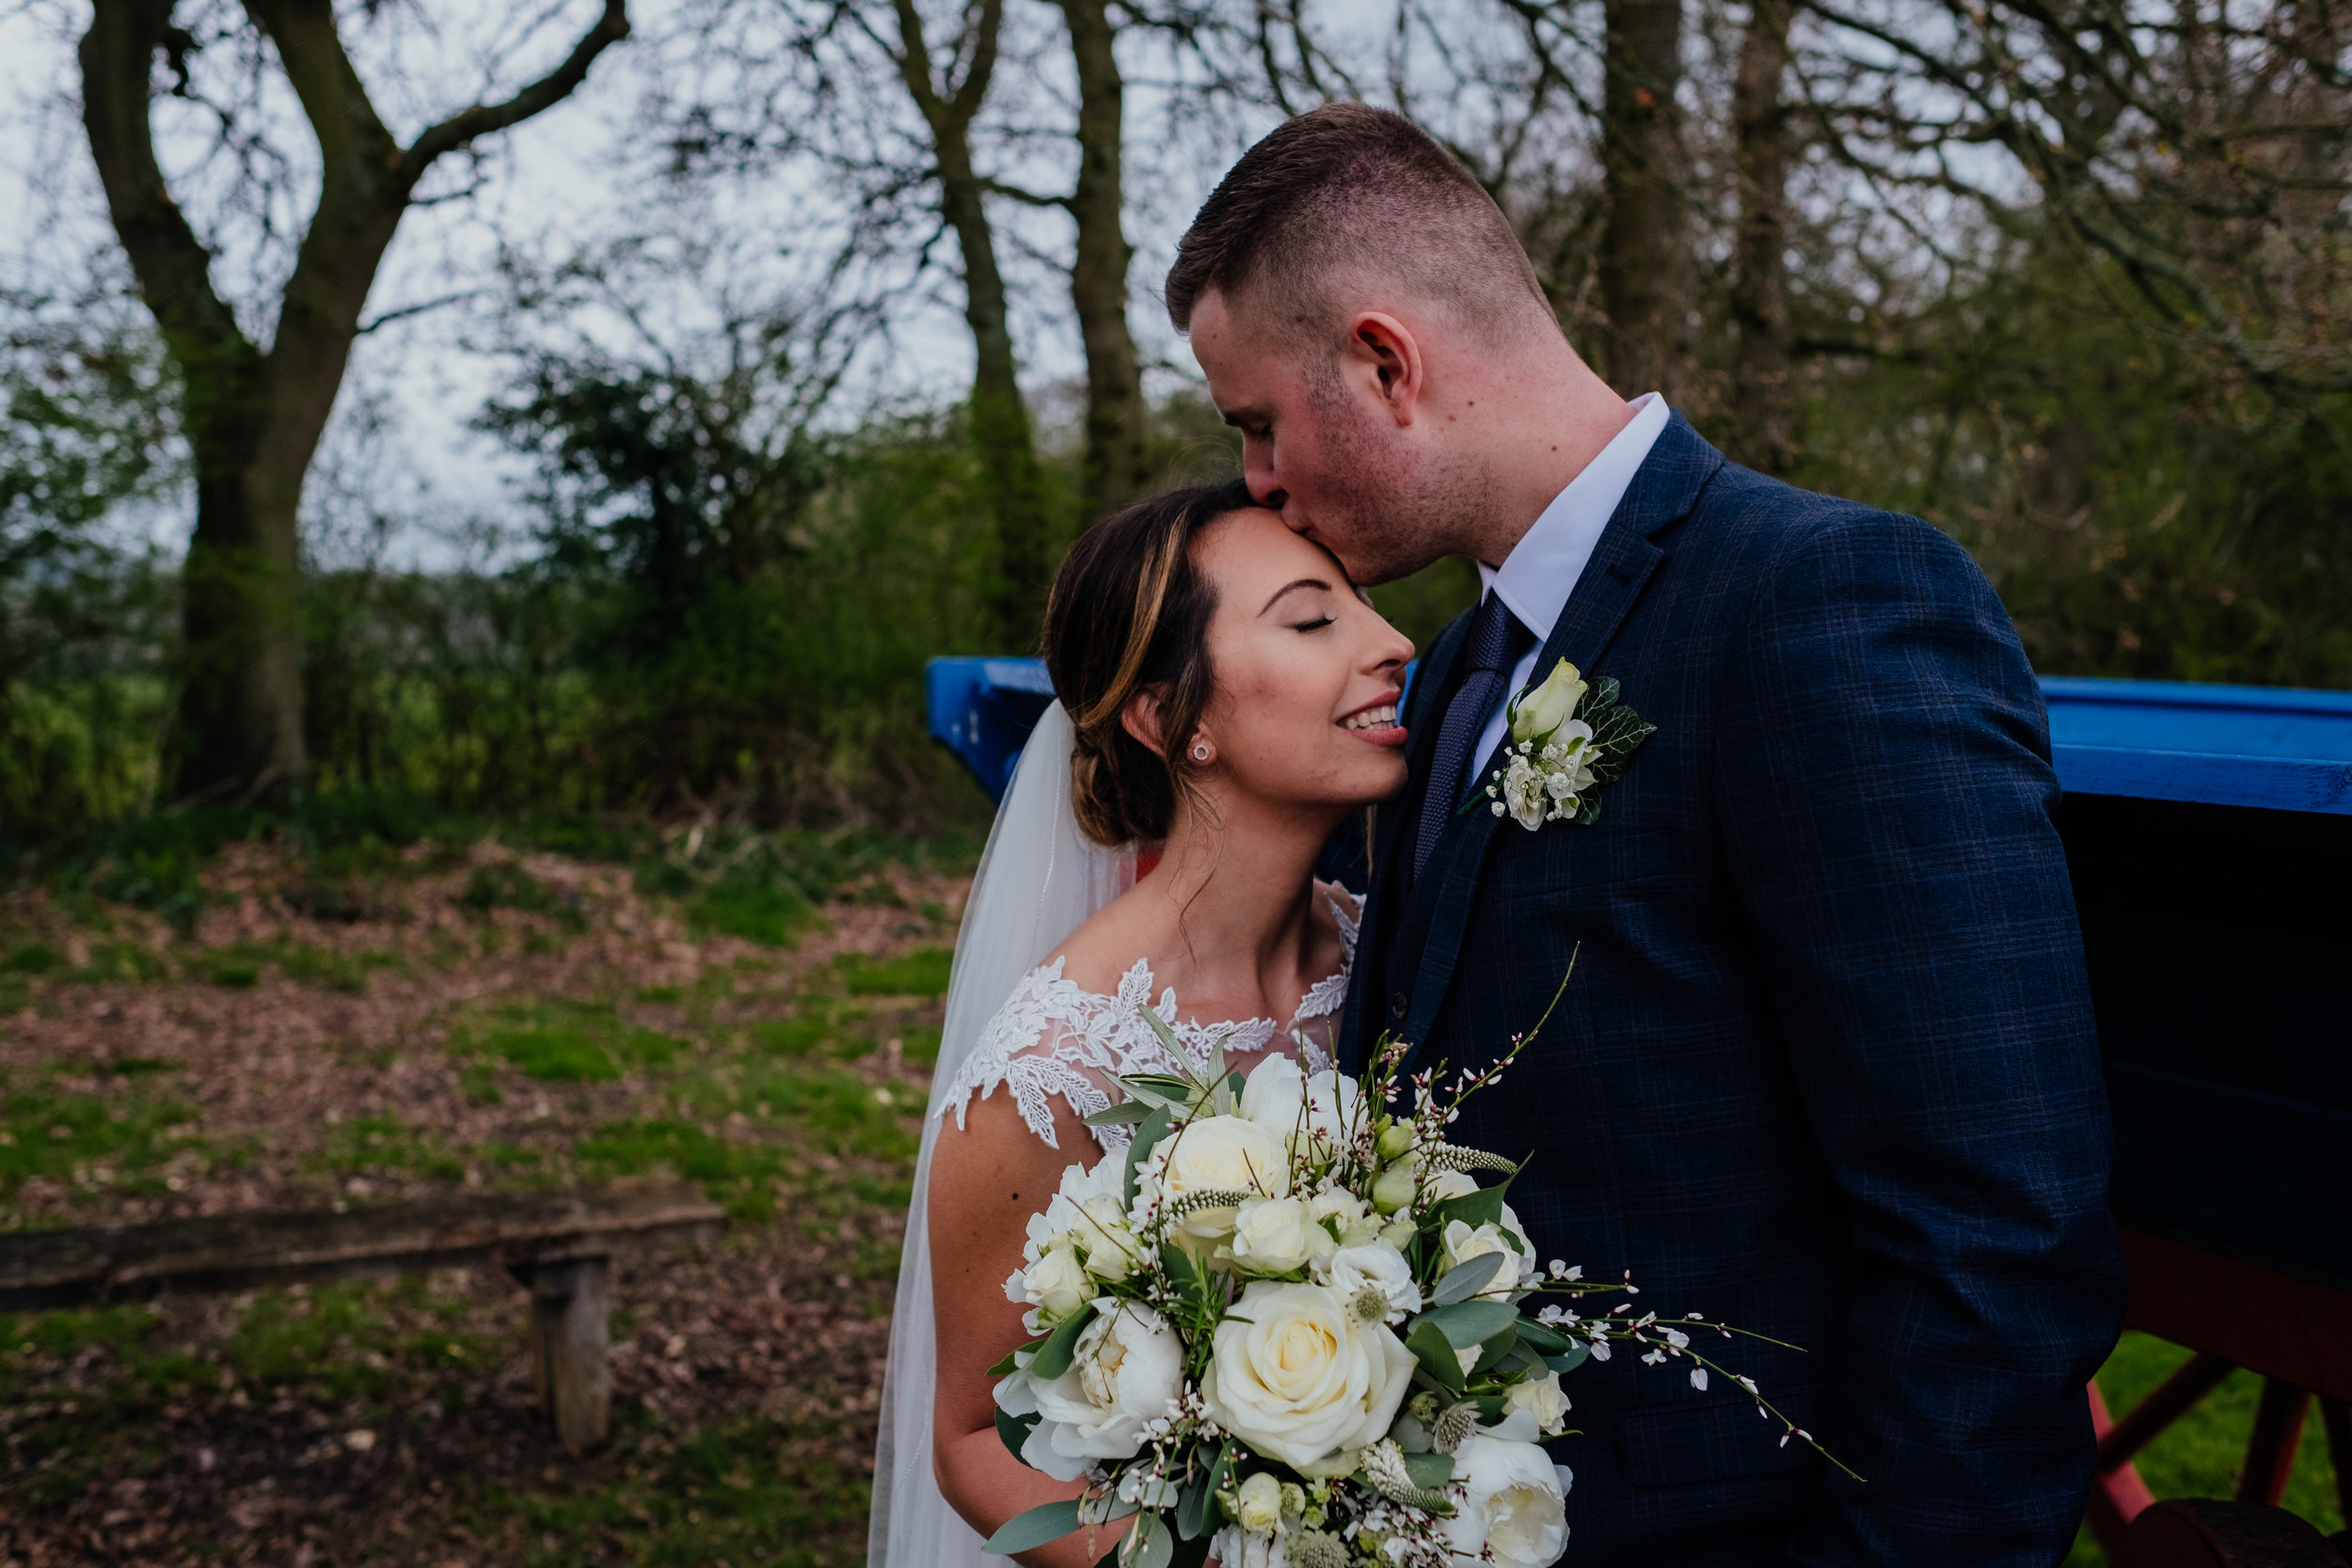 Groom kissing bride on forehead   Gildings Barn wedding photography